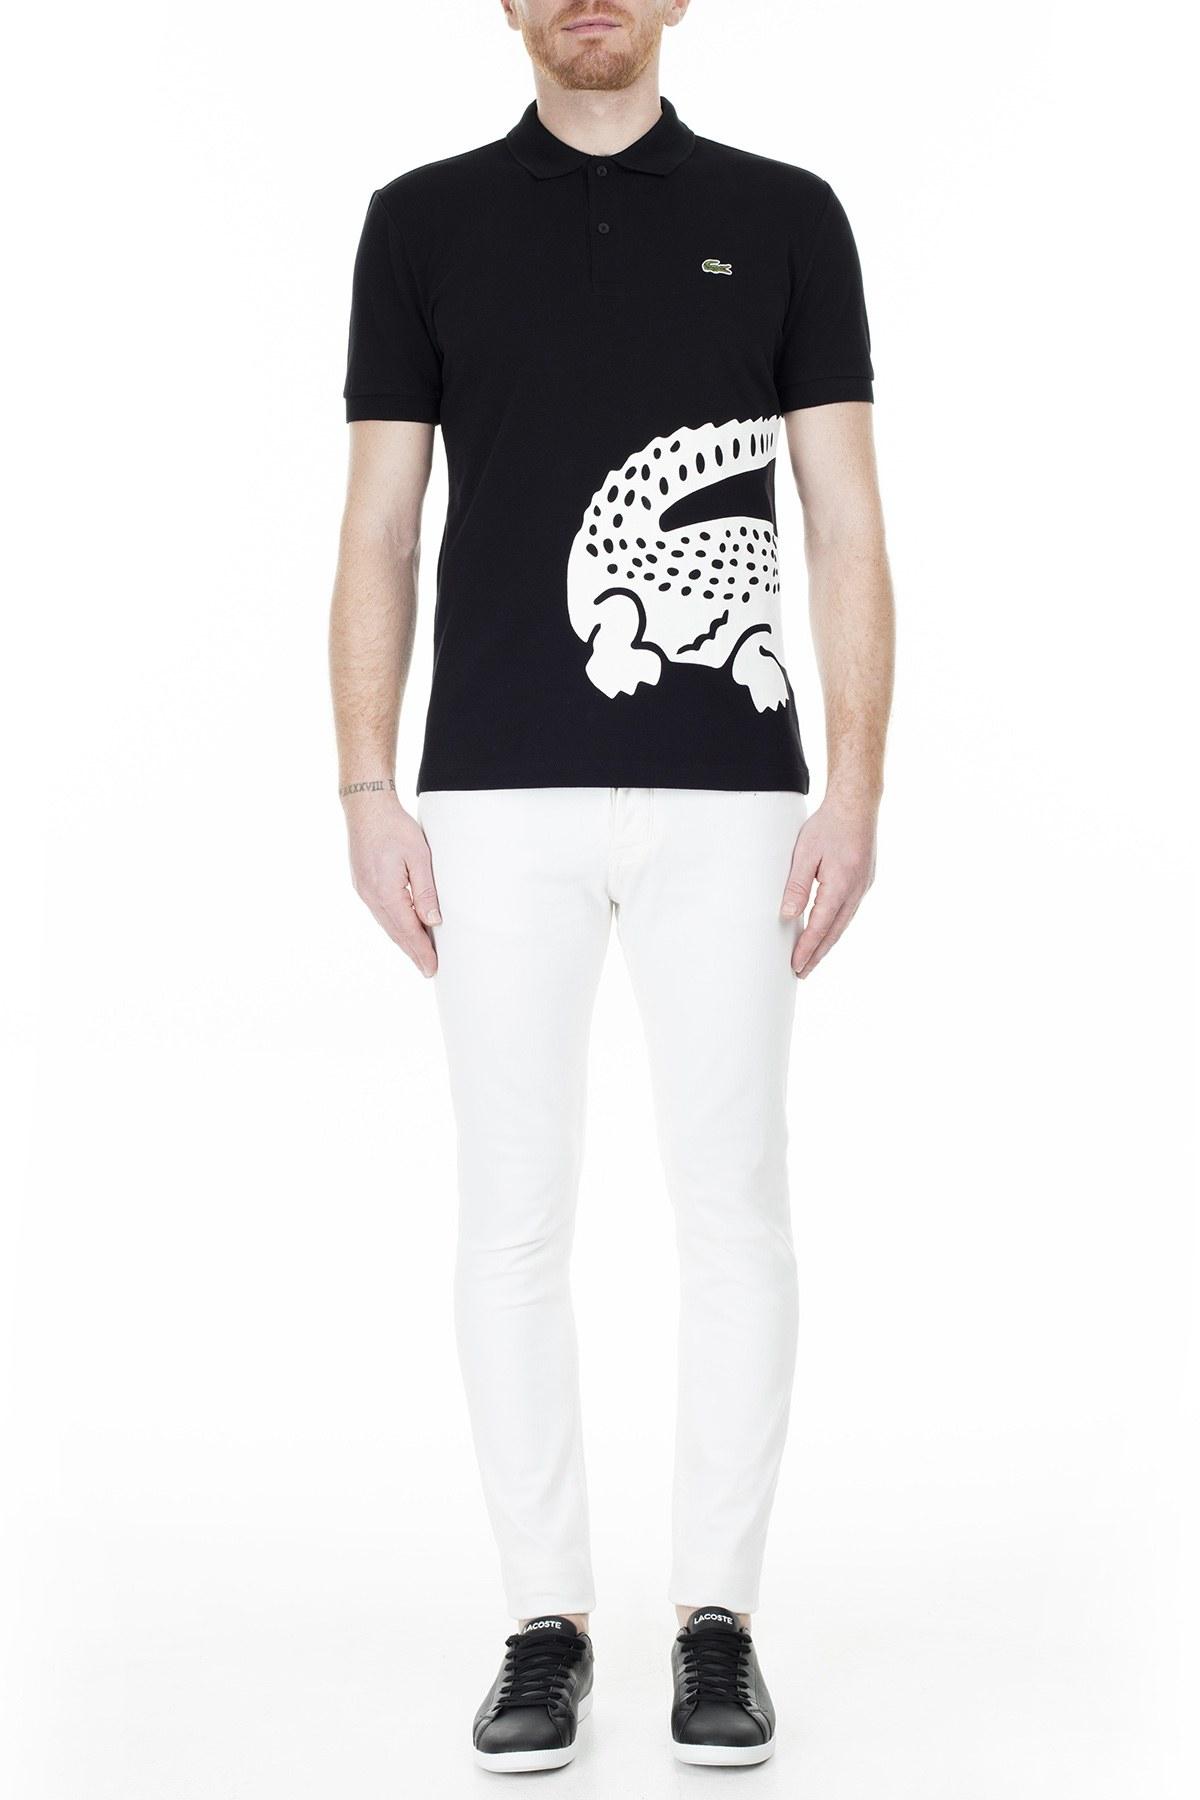 Lacoste Regular Fit T Shirt Erkek Polo PH5284 031 SİYAH